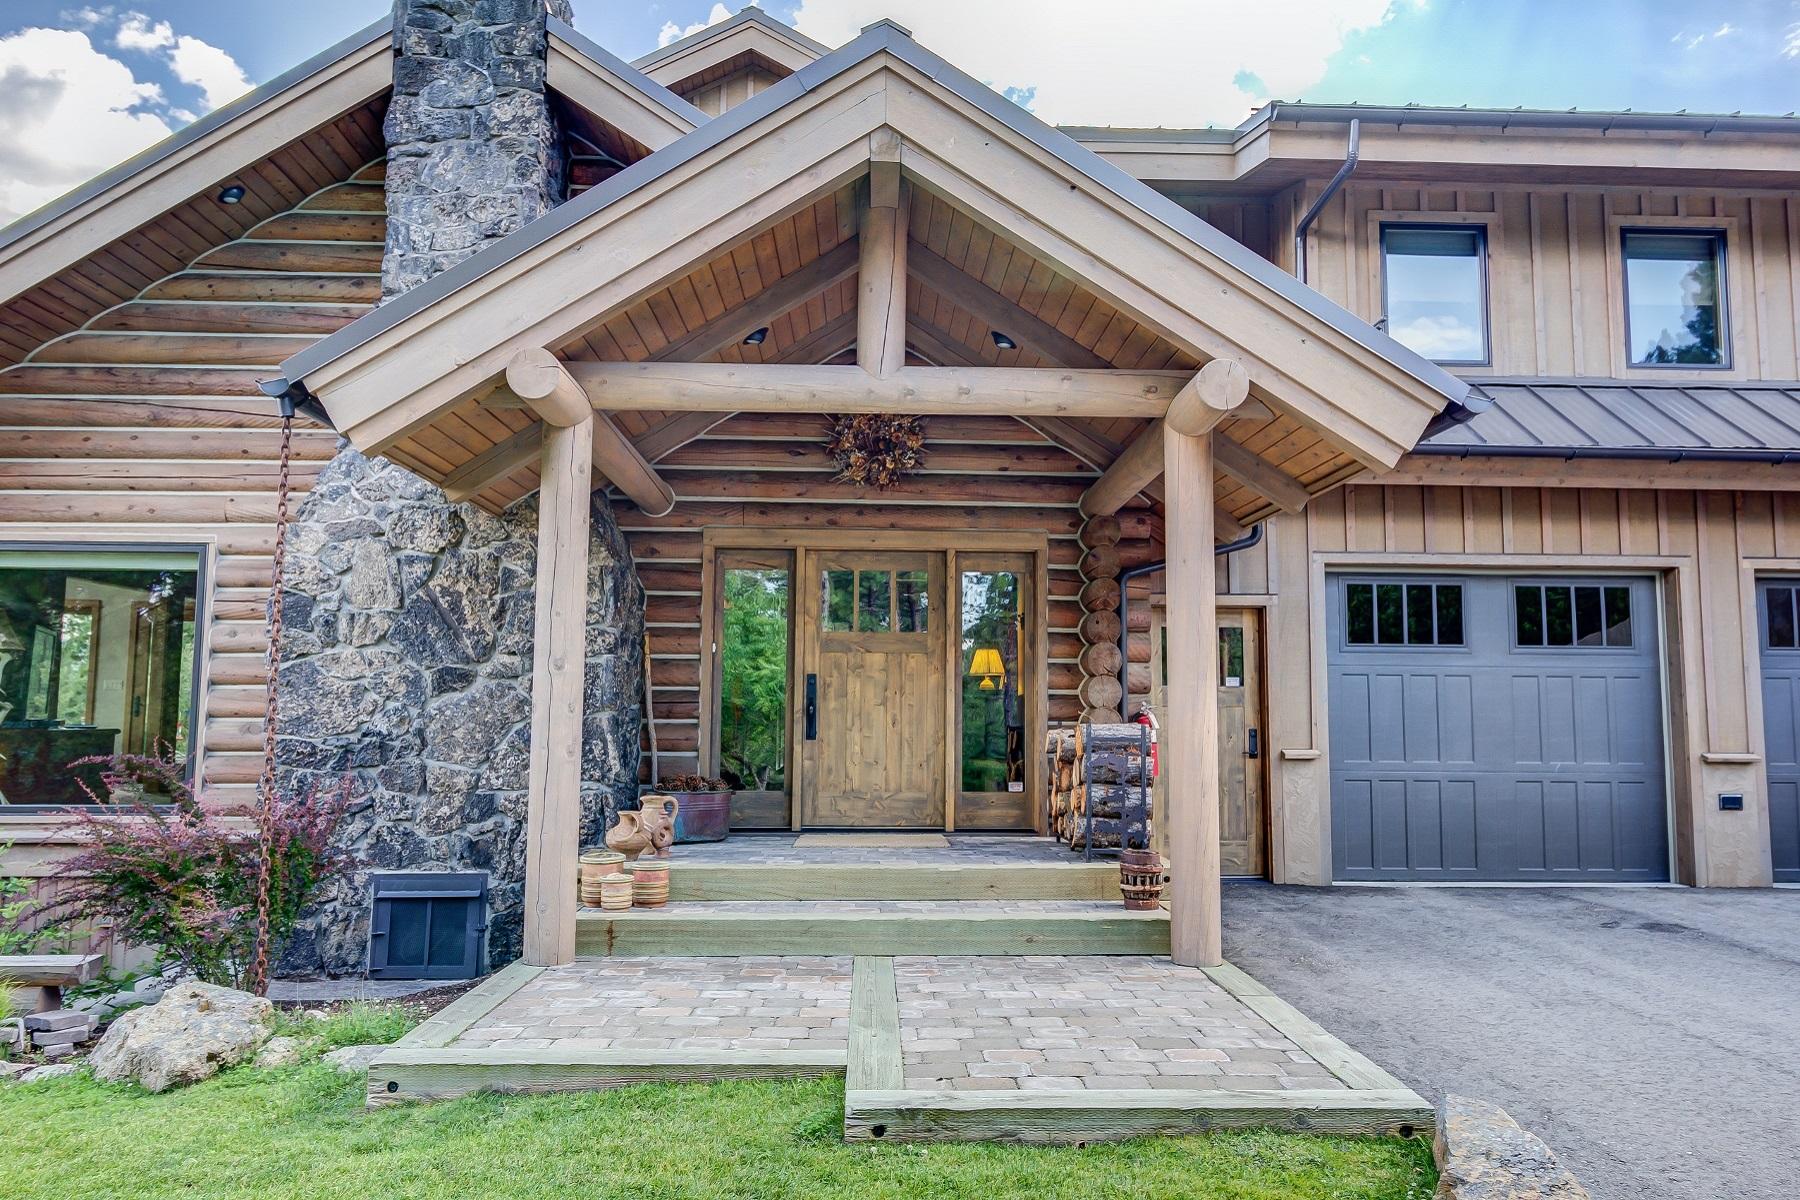 Additional photo for property listing at 251 Kucera 251  Kucera Road Darby, Montana 59829 United States